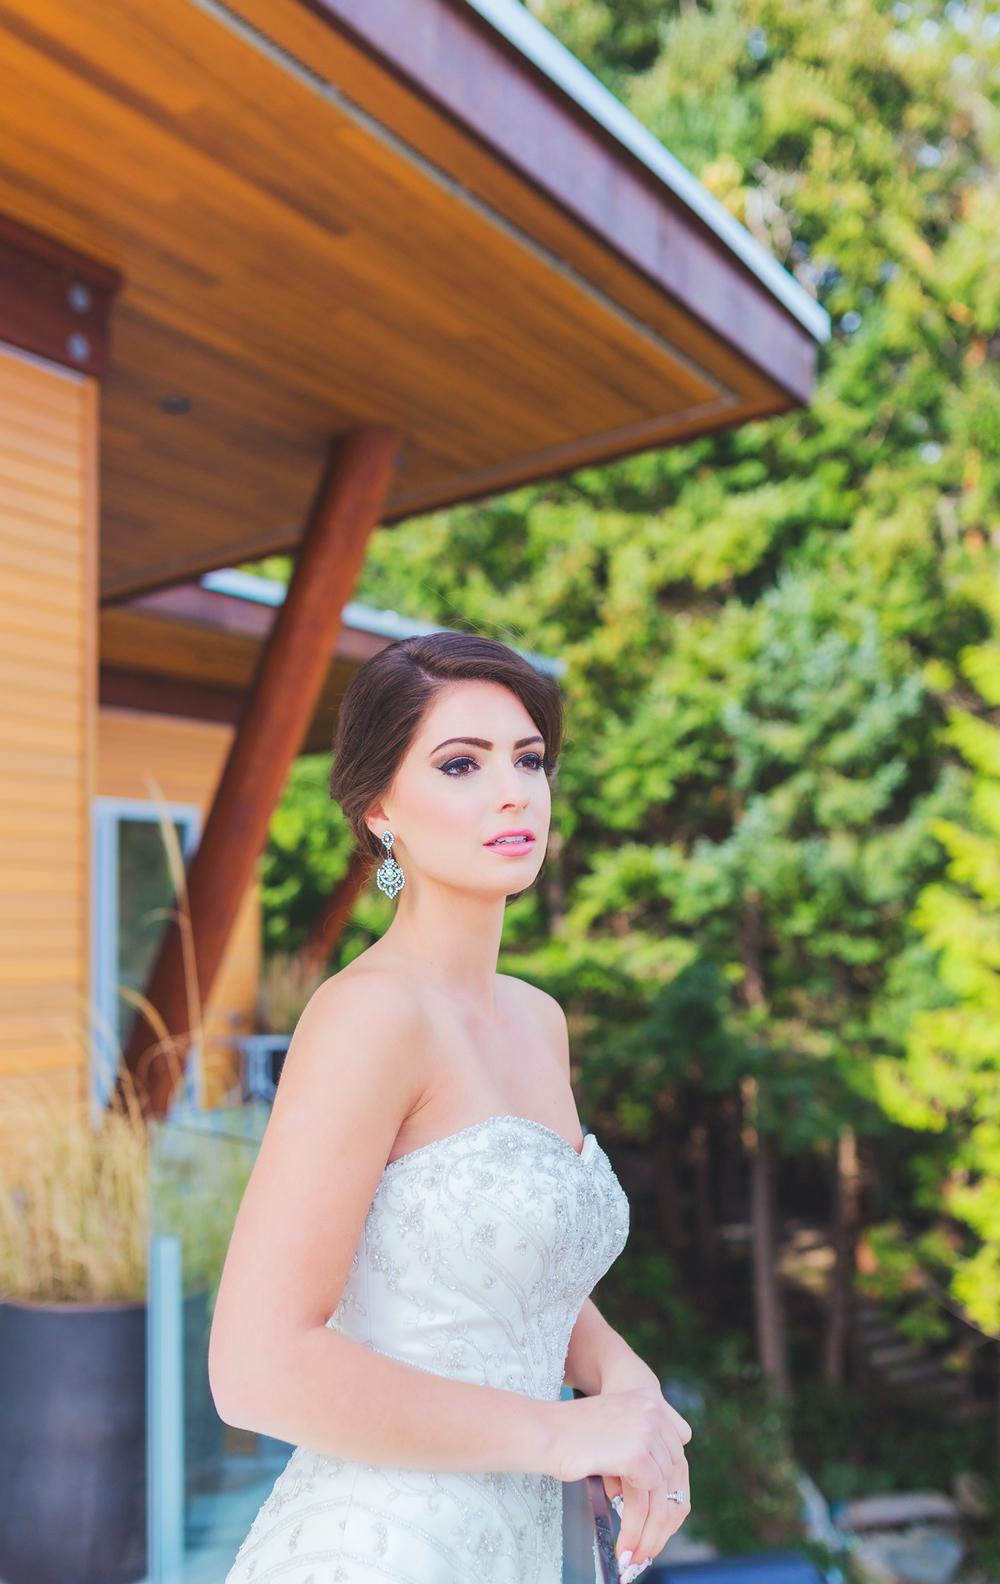 IMG_6275-BRIDAL-EDITORIAL-JENNIFER-PICARD-PHOTOGRAPHY-FINE-ART-WEDDINGS.jpg